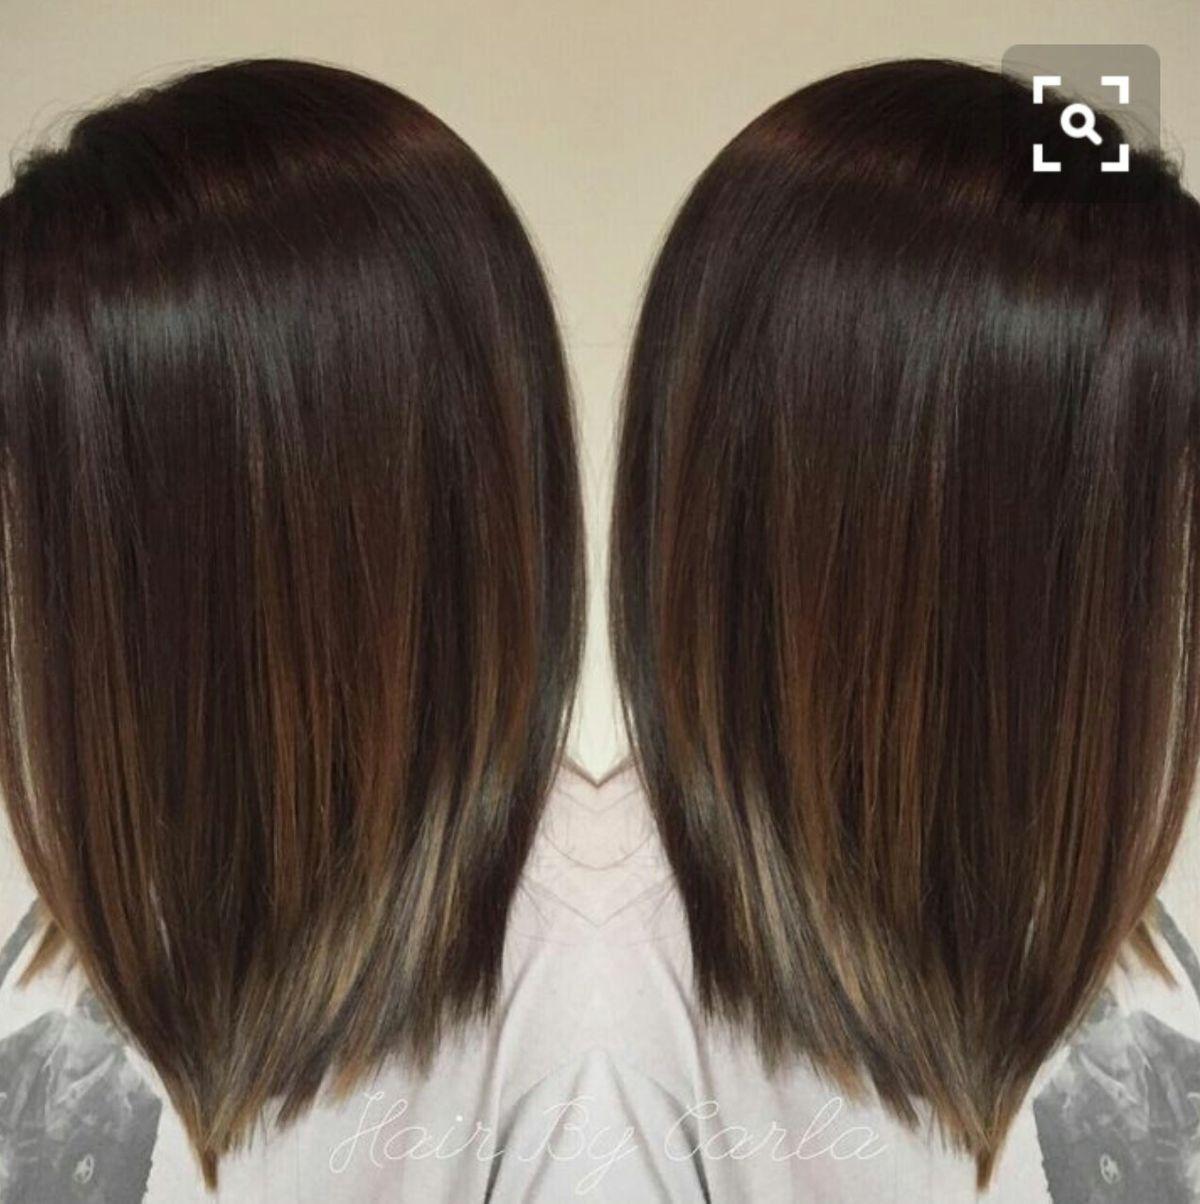 Medium Length Haircut Hair Styles Balayage Straight Hair Balayage Hair